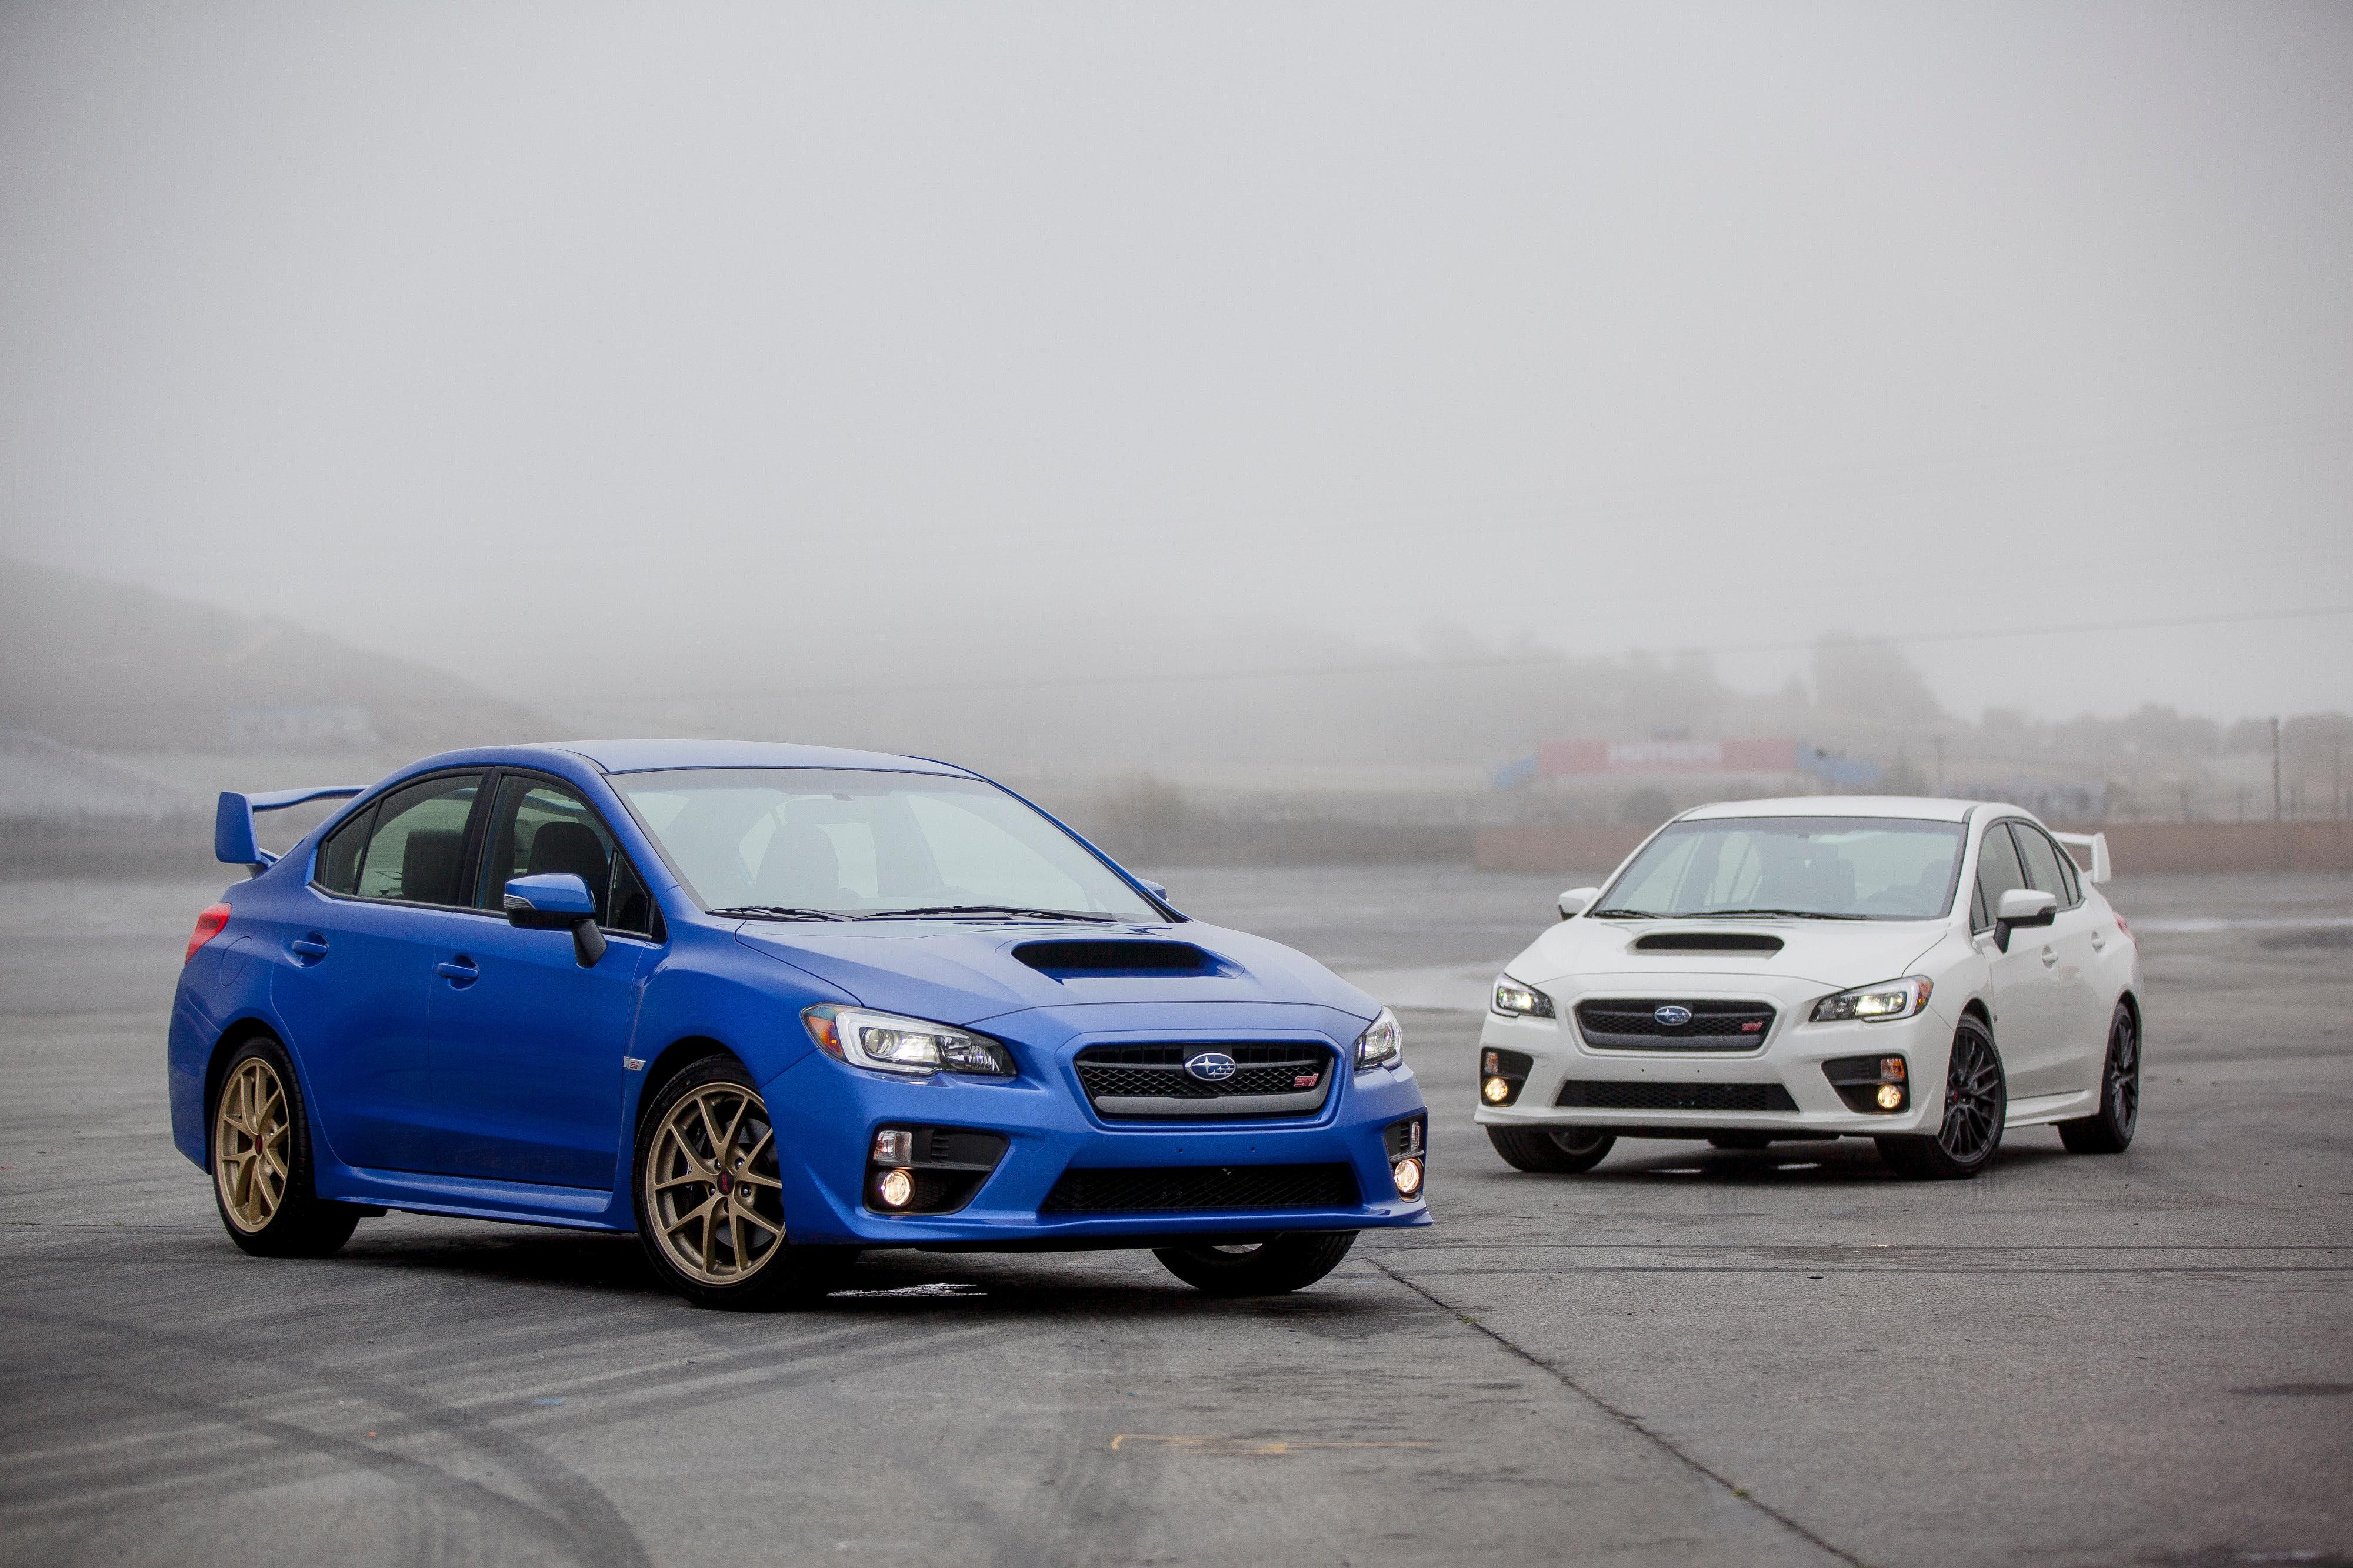 2015 Subaru WRX STI Front Three Quarter 02